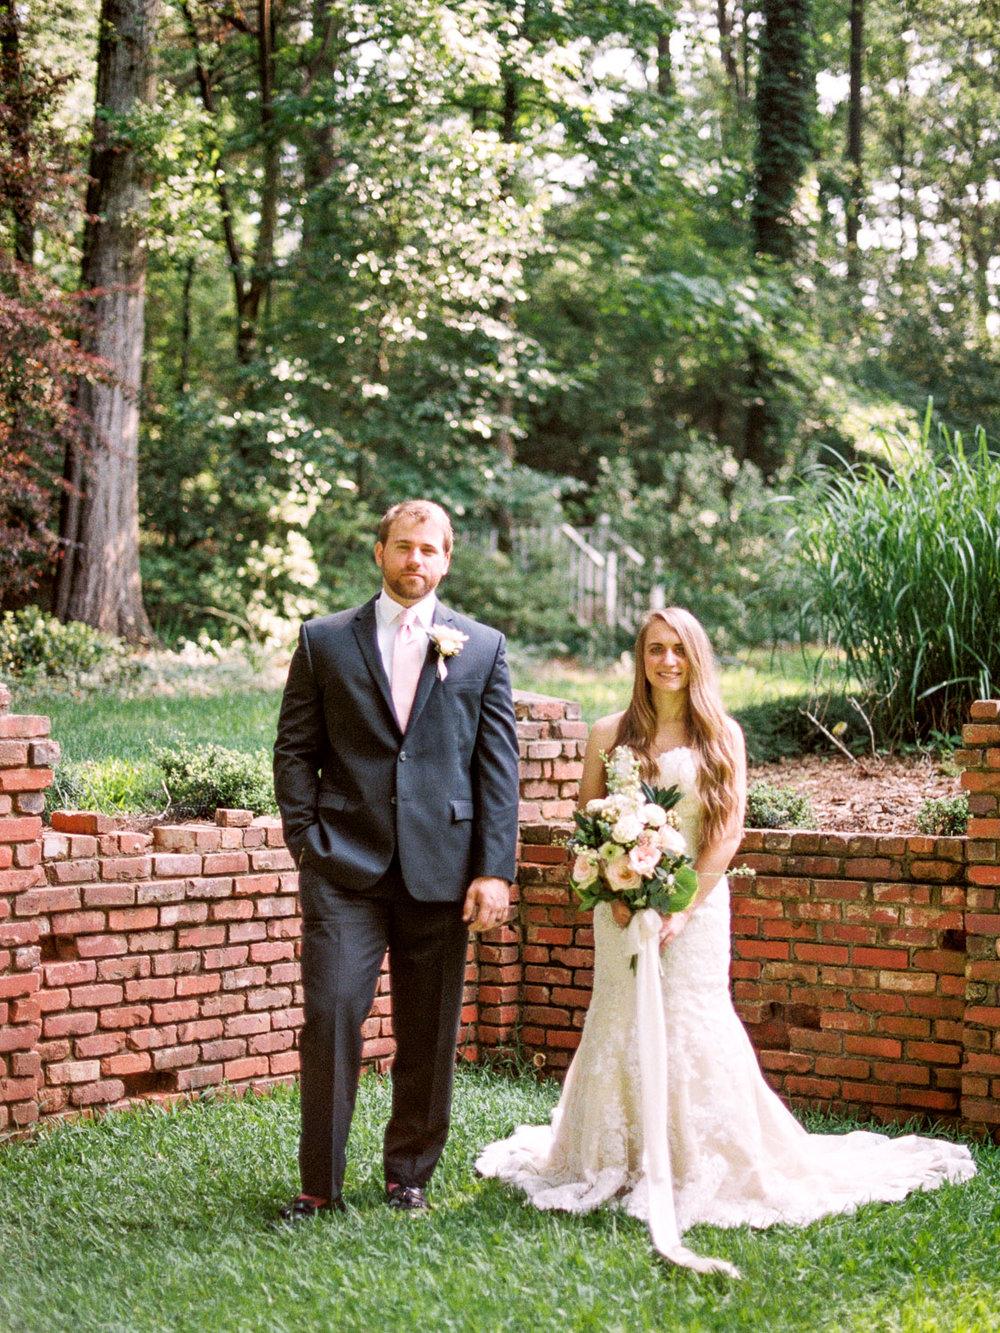 christinadavisphotography-romanticwedding-gardenweddinginspiration21.jpg